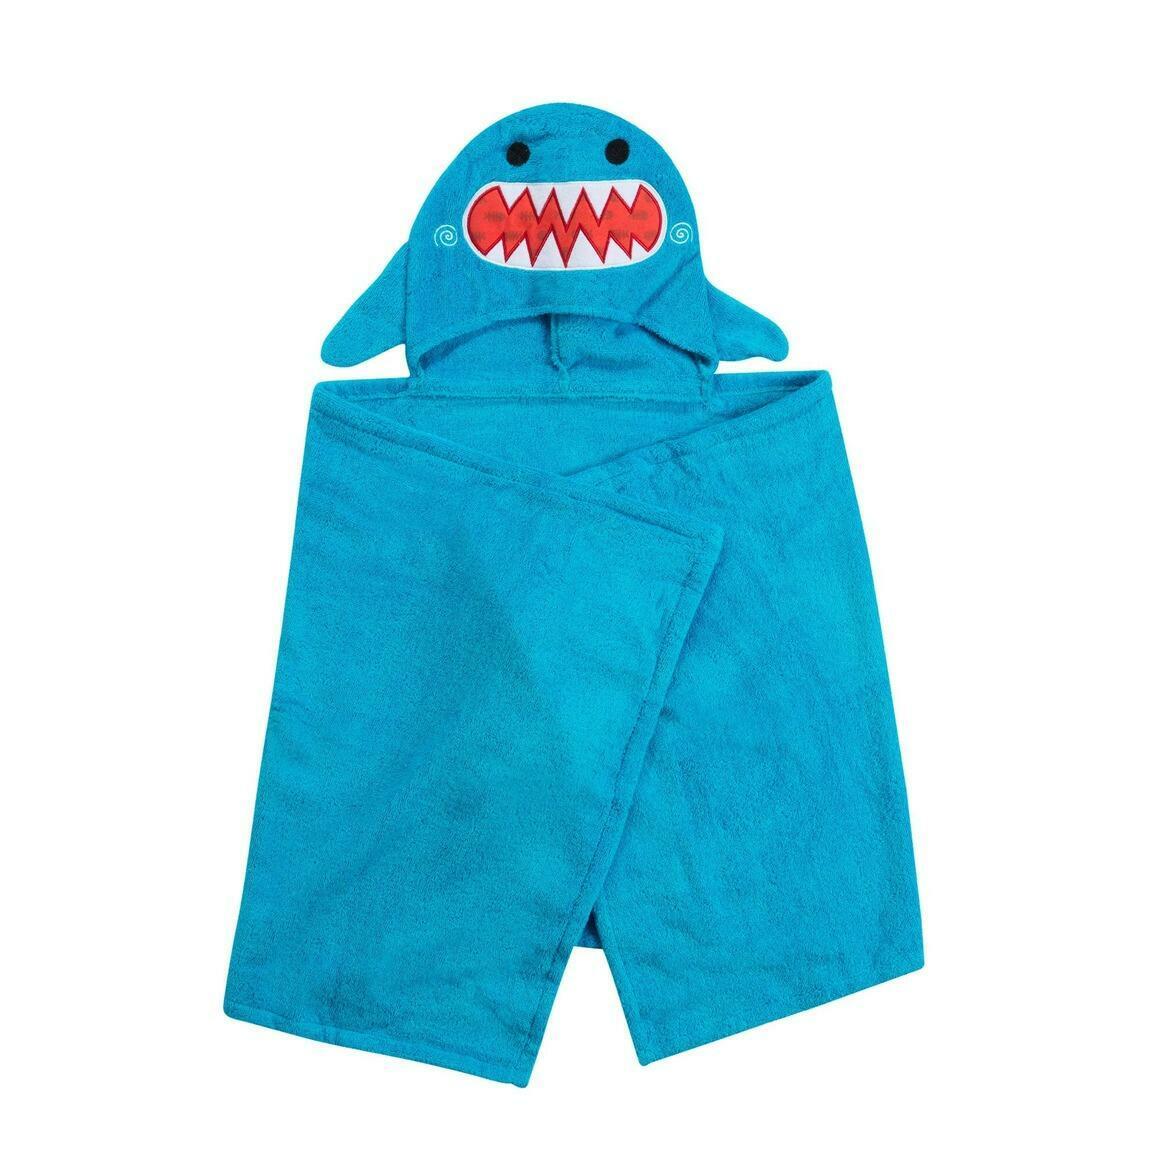 Sherman the Shark Toddler Towel | Trada Marketplace